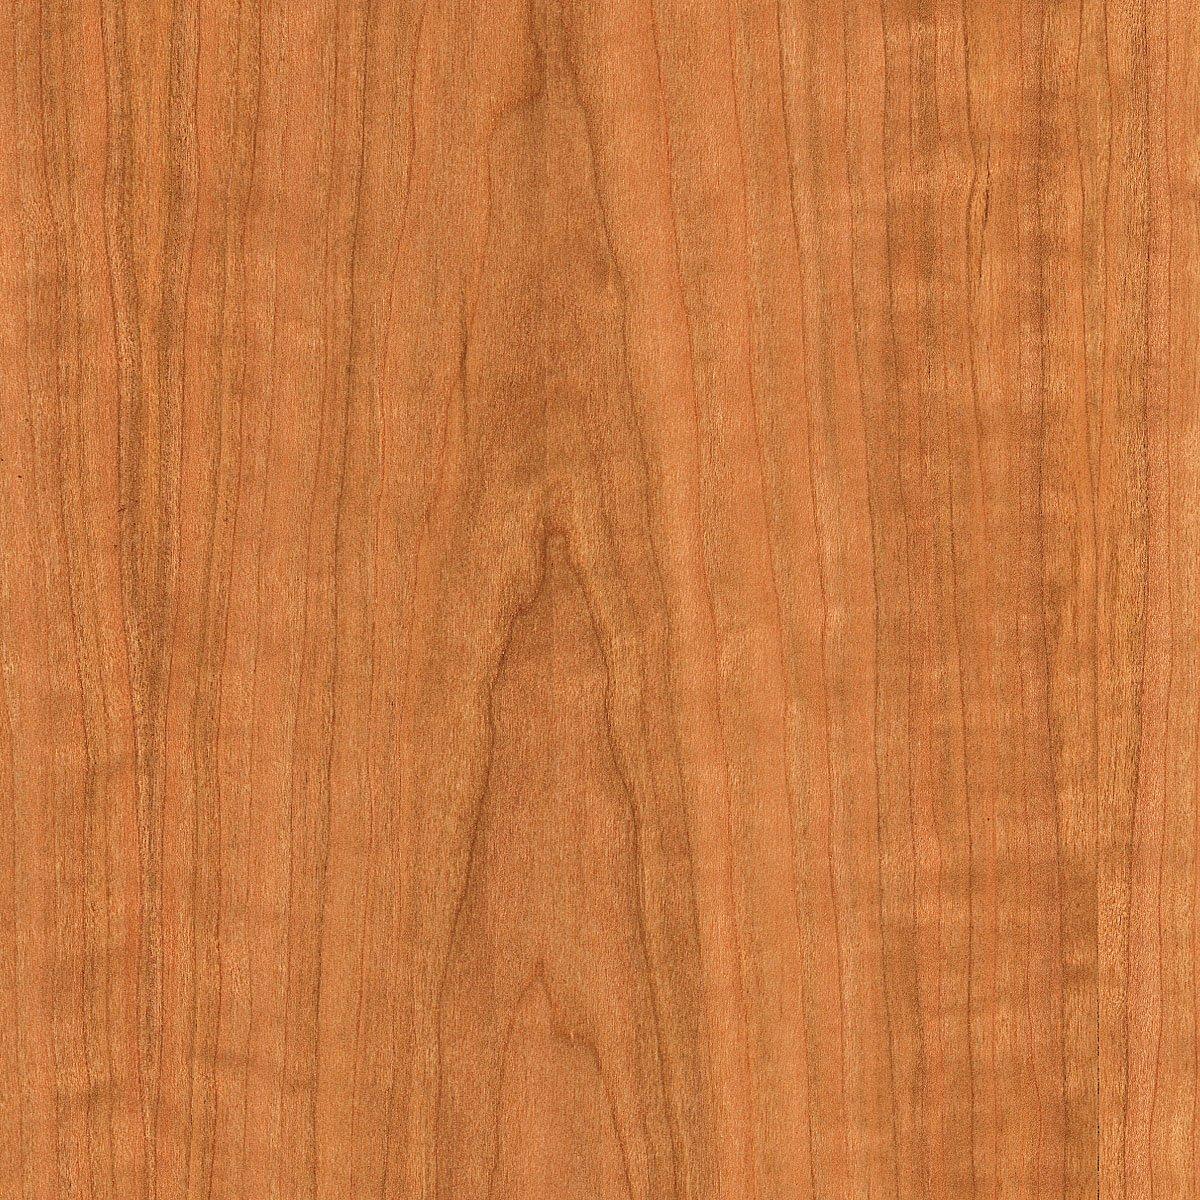 cherry wood veneer plain sliced 2x8 psa 9505 sheet